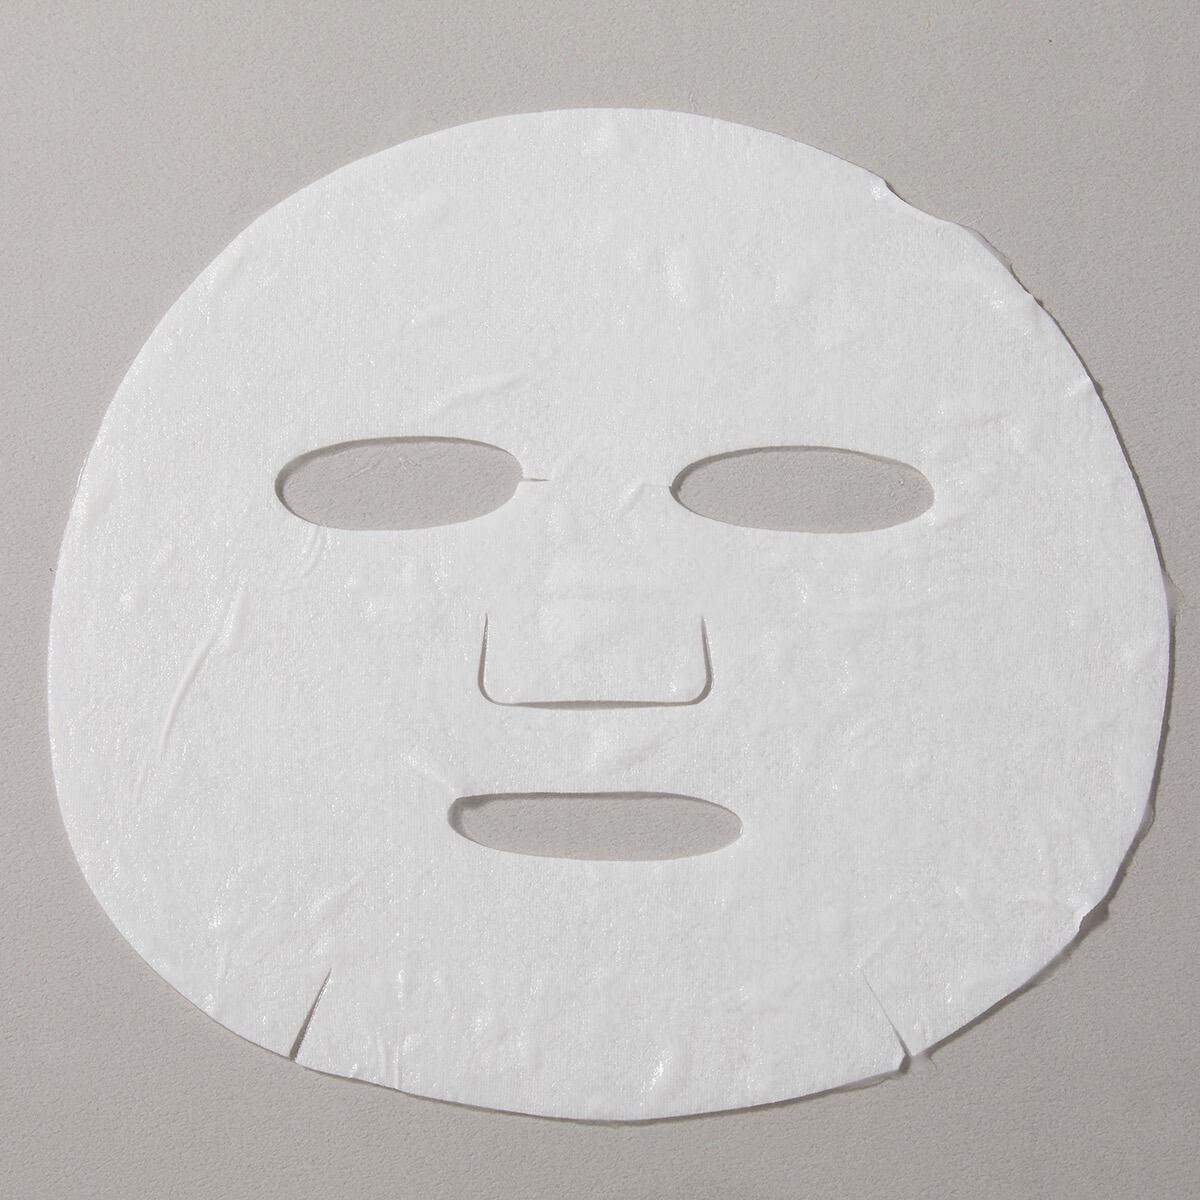 Real Barrier(リアルバリア)『エクストリームクリームマスク』の使用感をレポに関する画像15